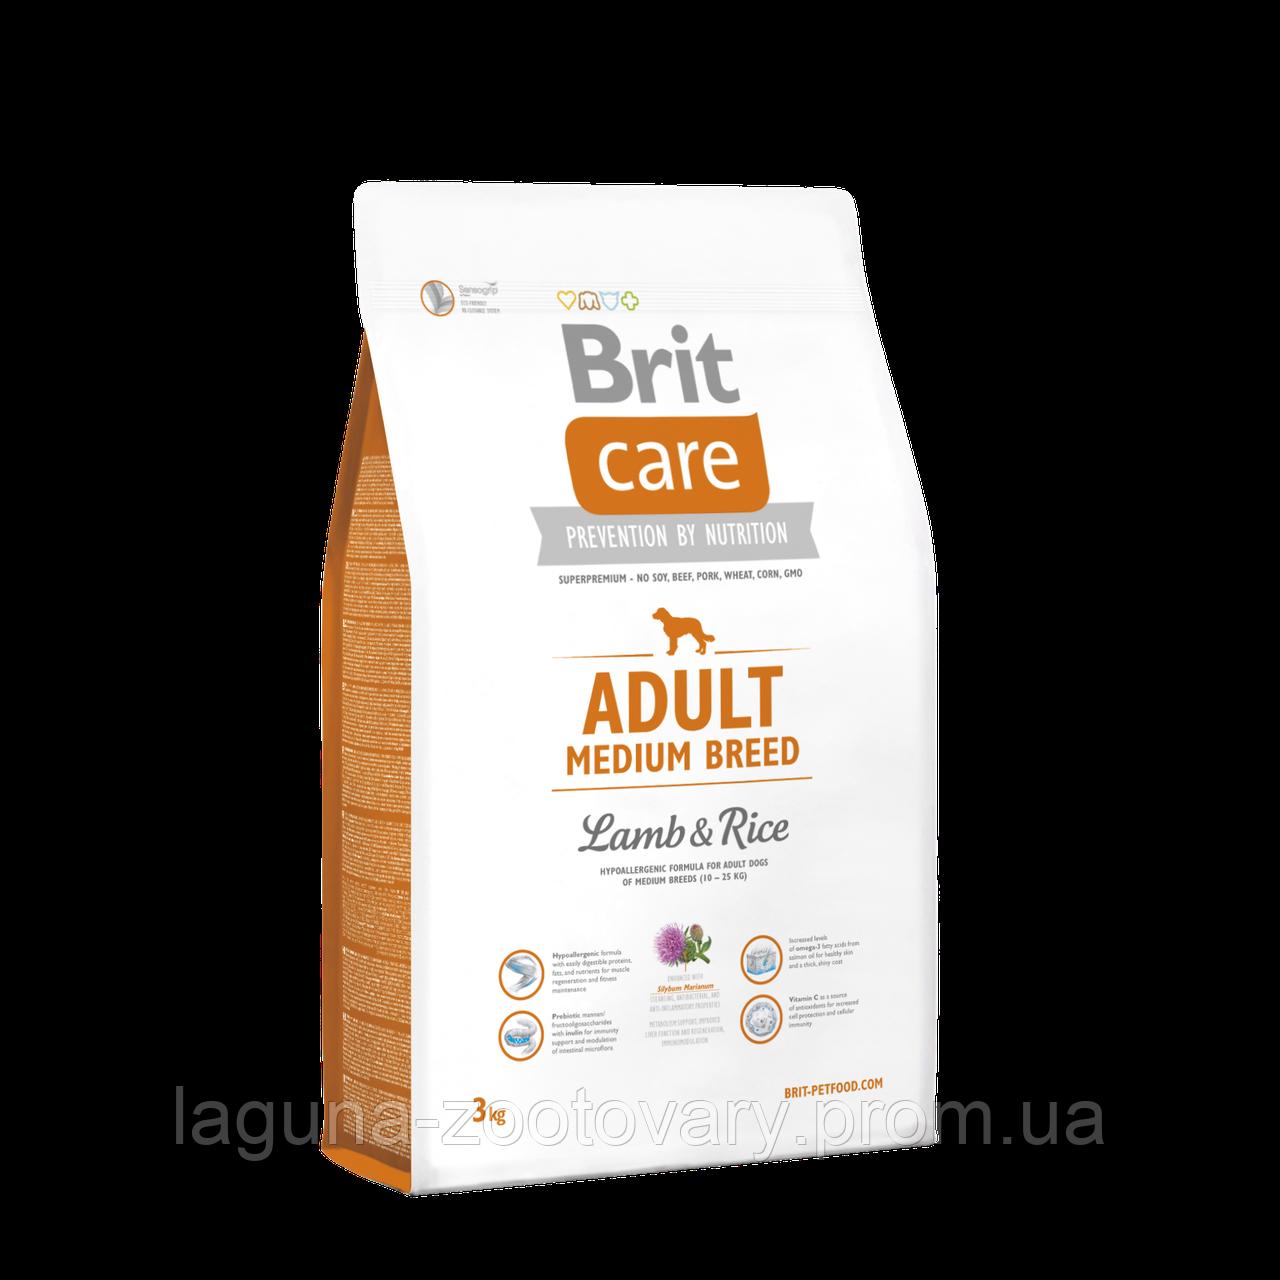 Brit Care Adult Medium Breed Lamb & Rice 3 kg (д/собак весом от 10 до 25 кг)